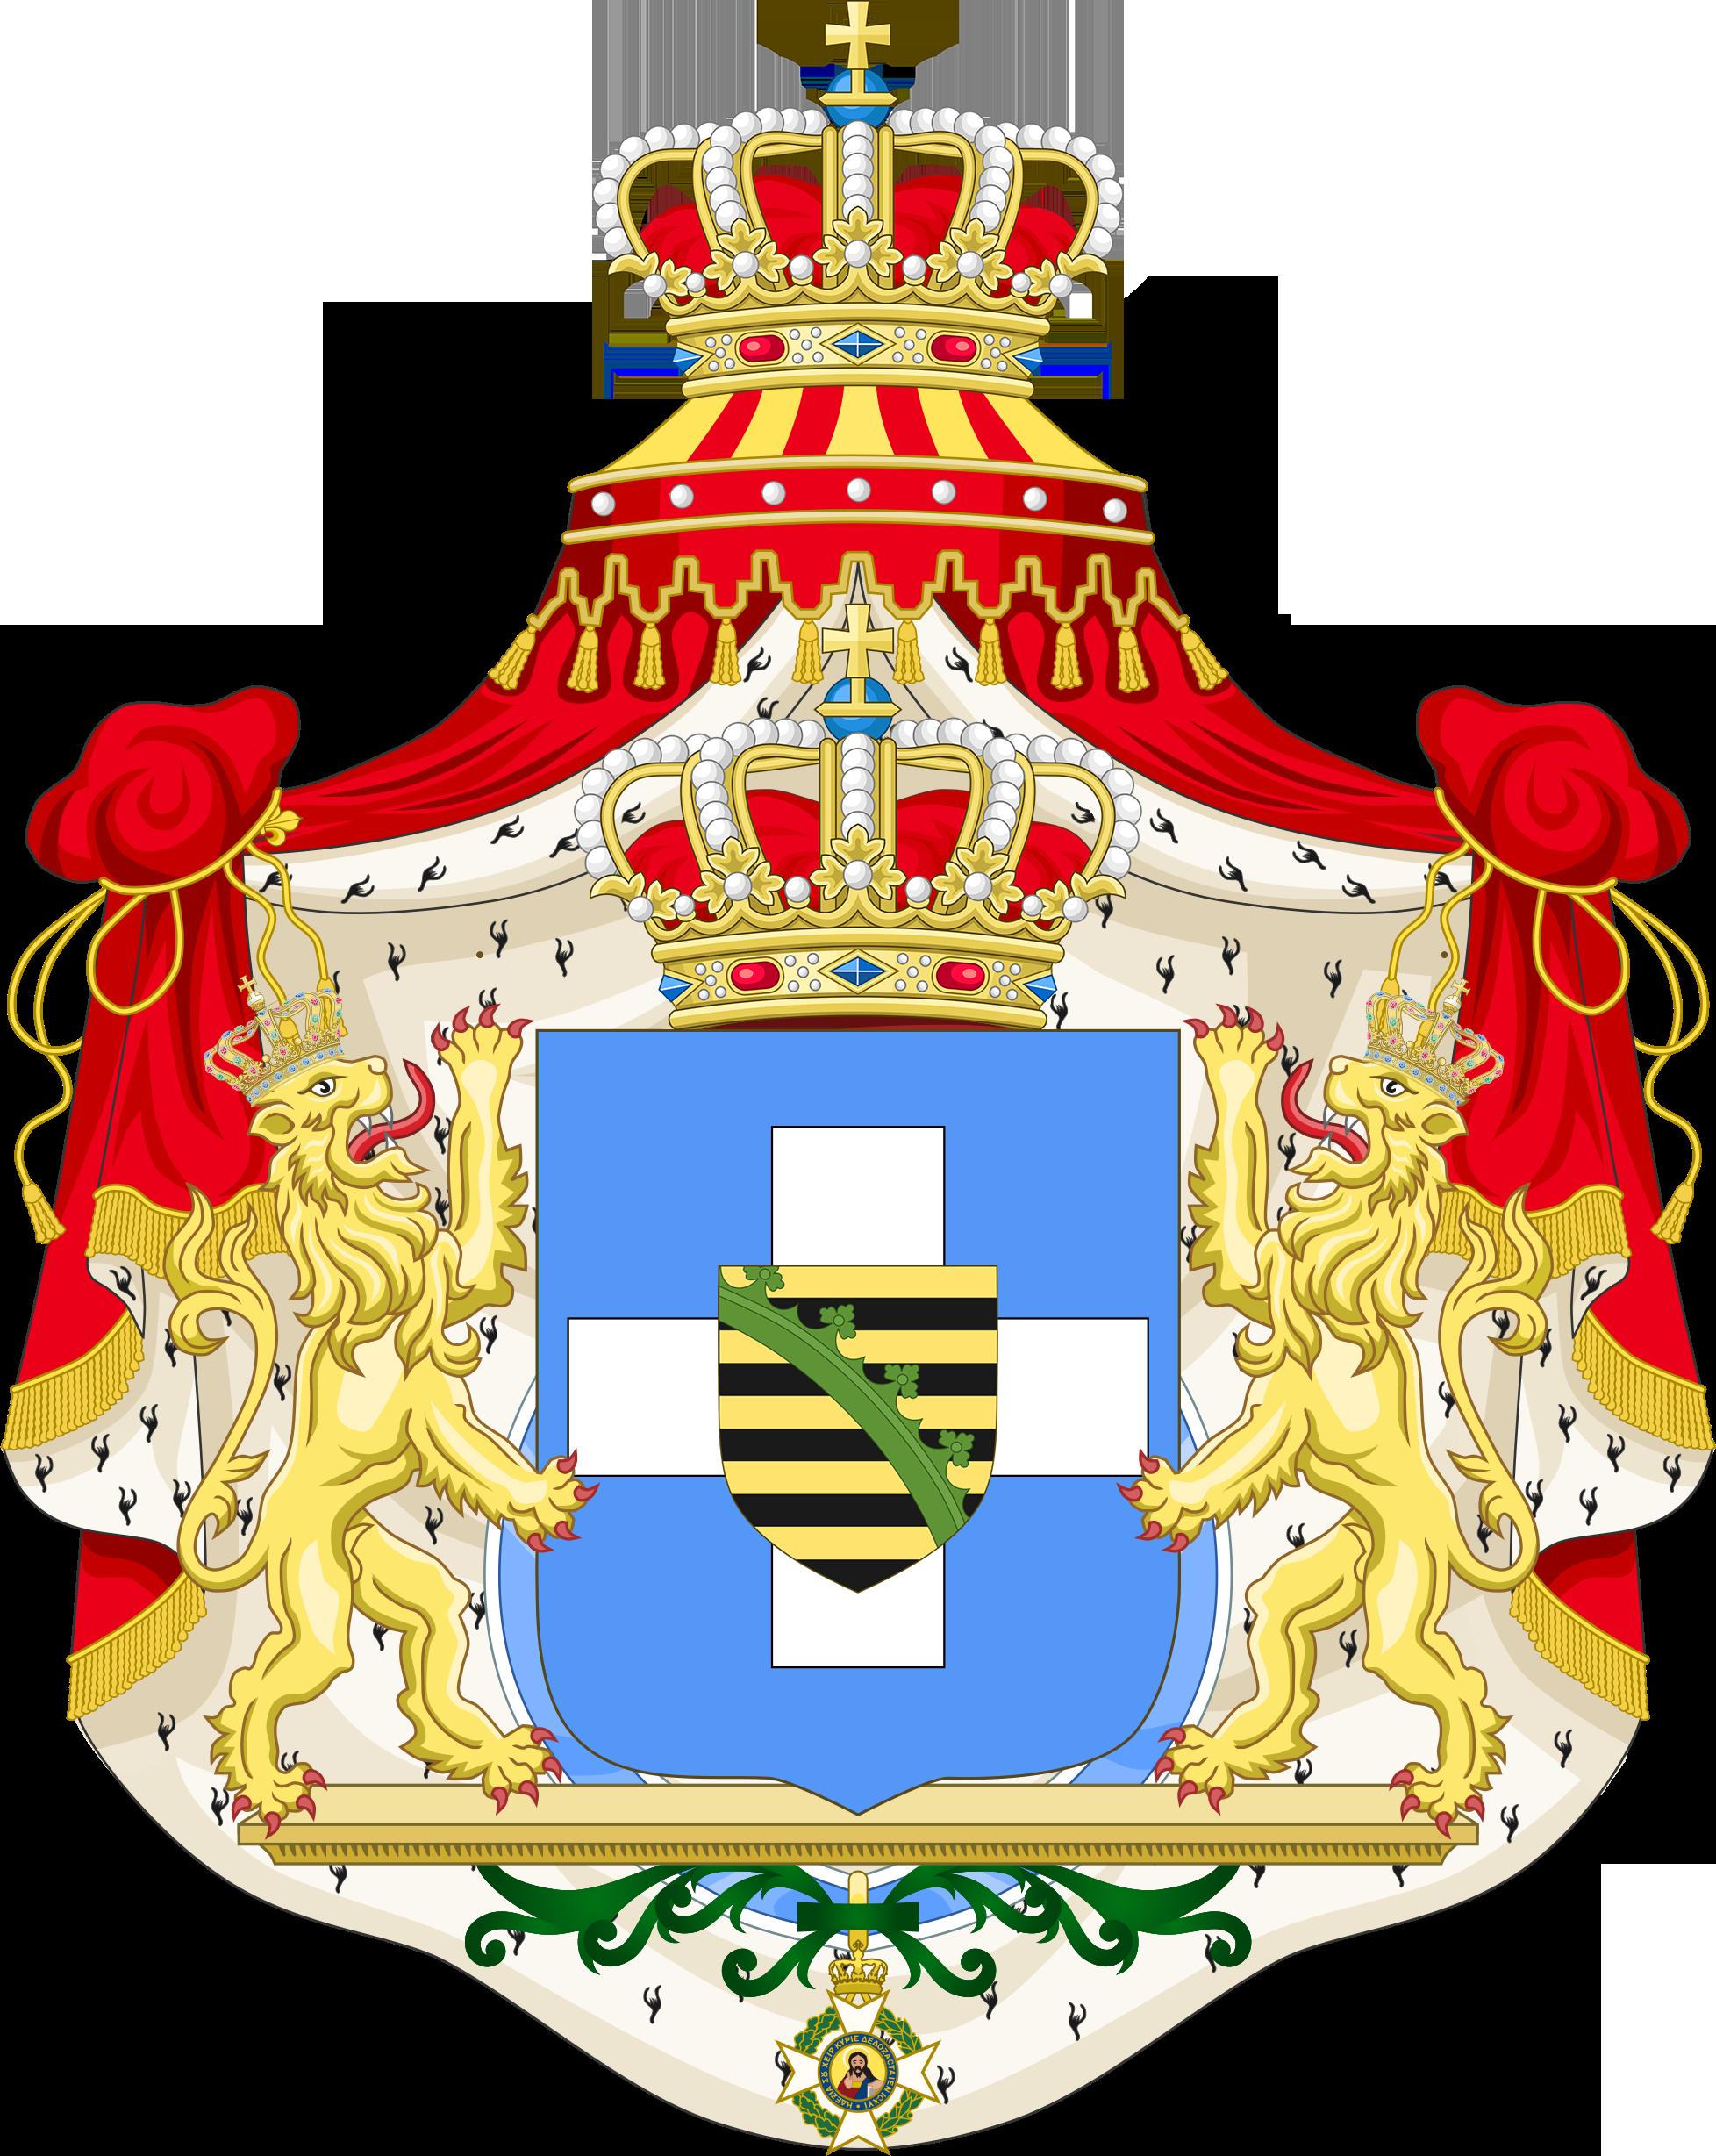 Королевство Греция (Свобода, равенство, братство!)